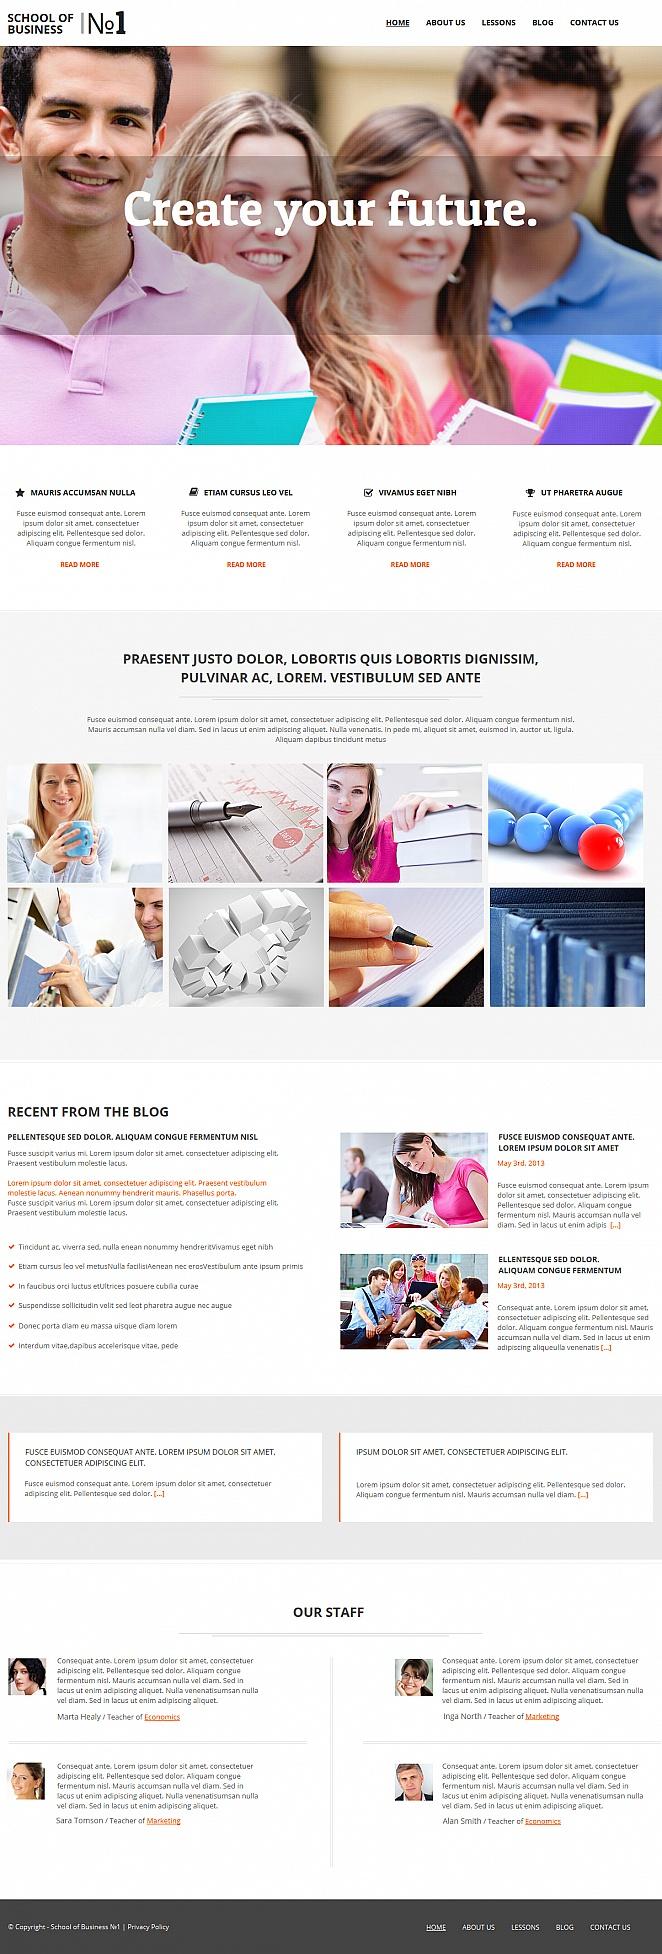 Business School Website Template with Drop-Down Menu - image